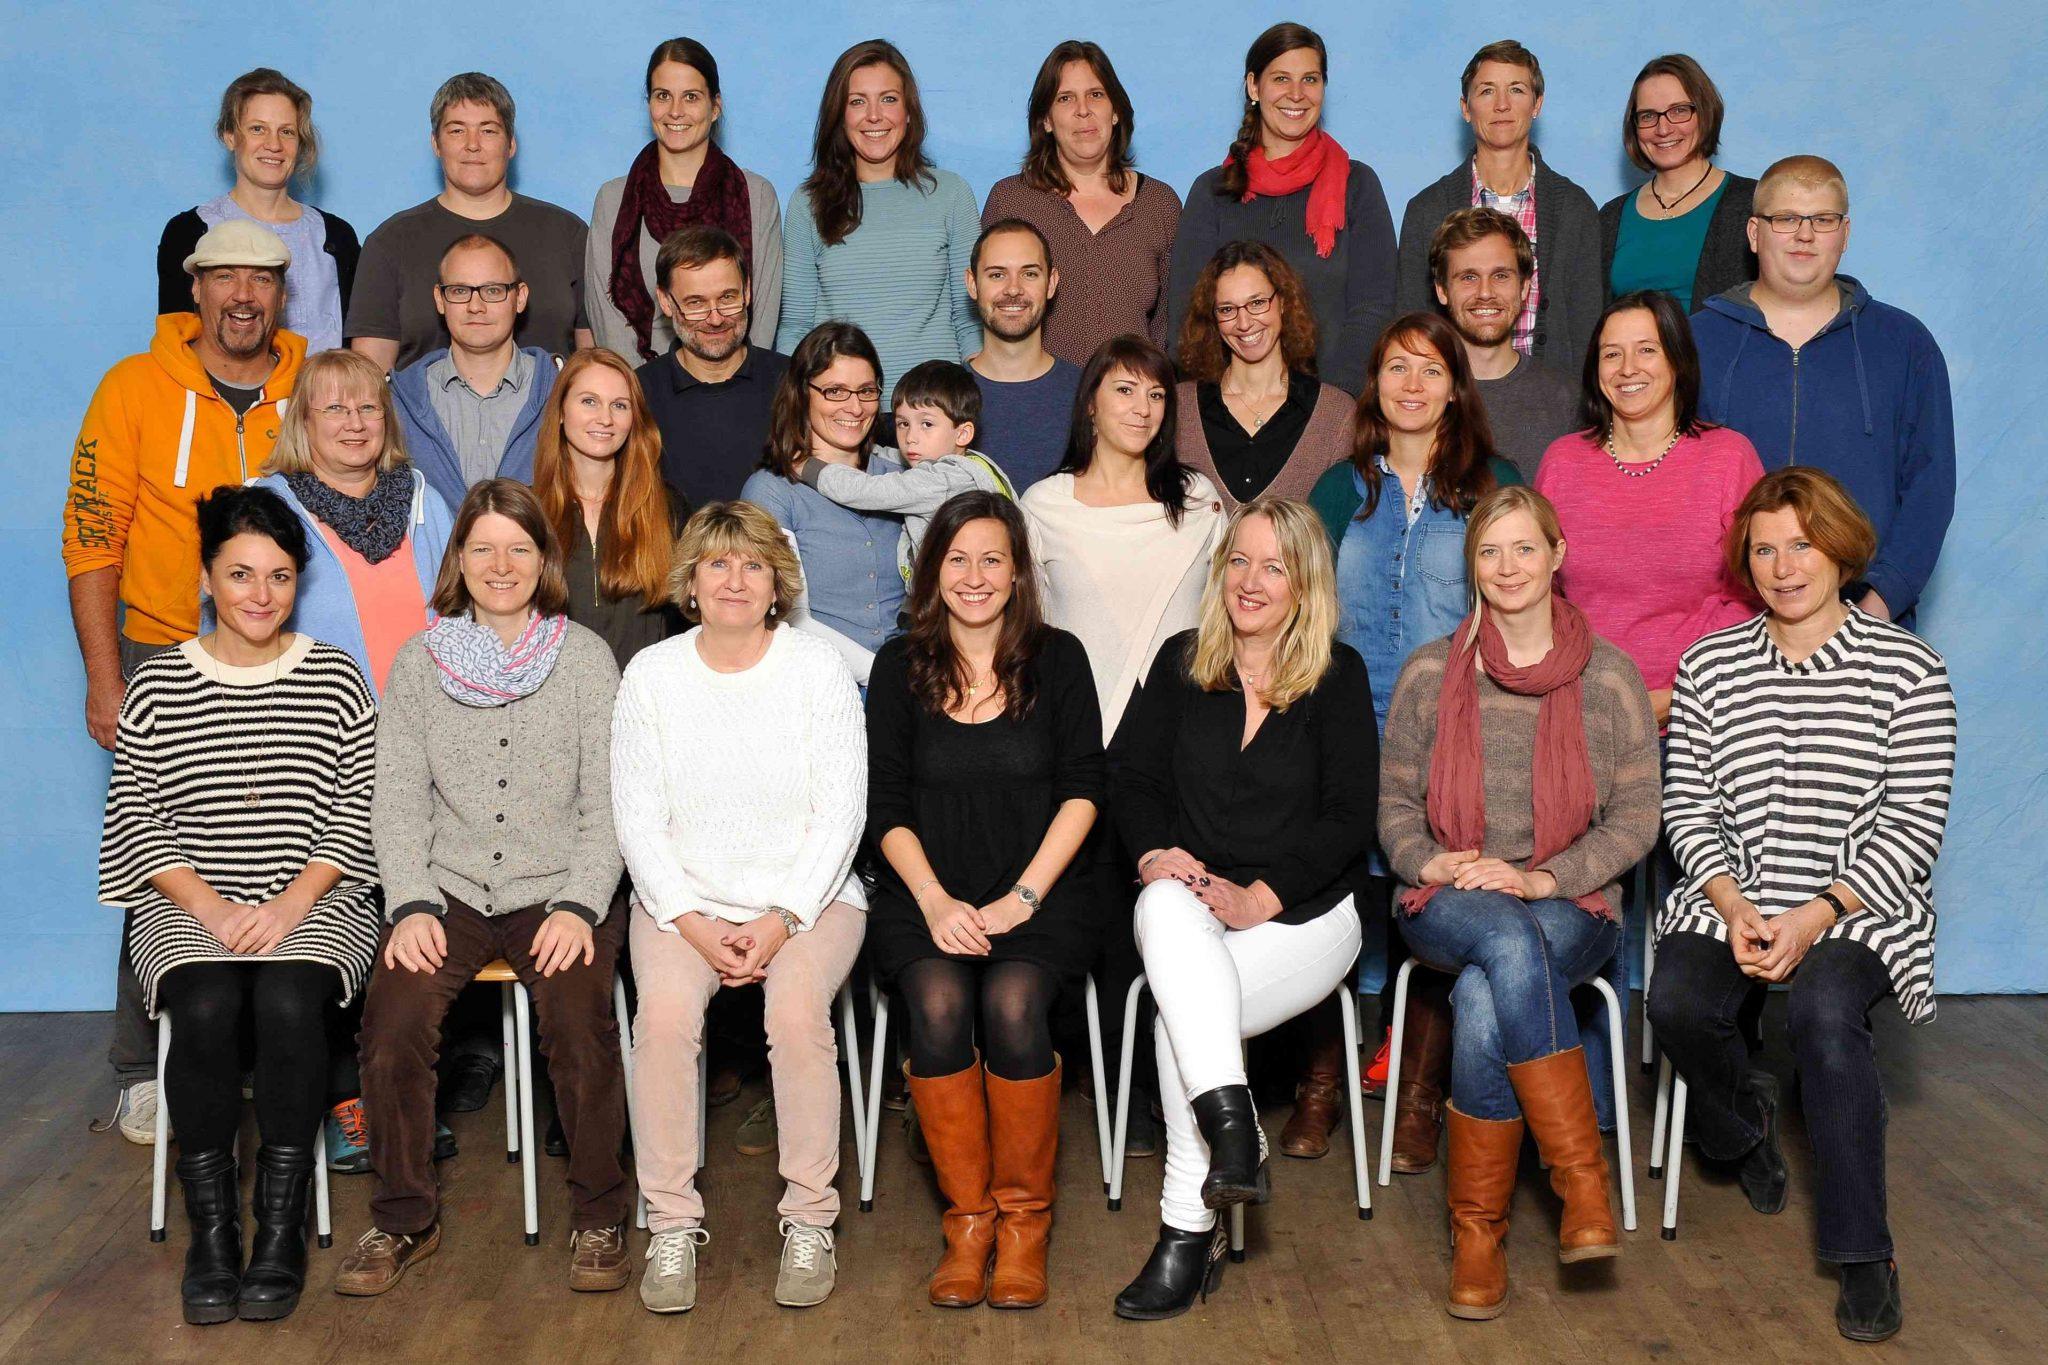 kollegium  u2013 grundschule gro u00df flottbek datenschutzerklaerung meaning in english